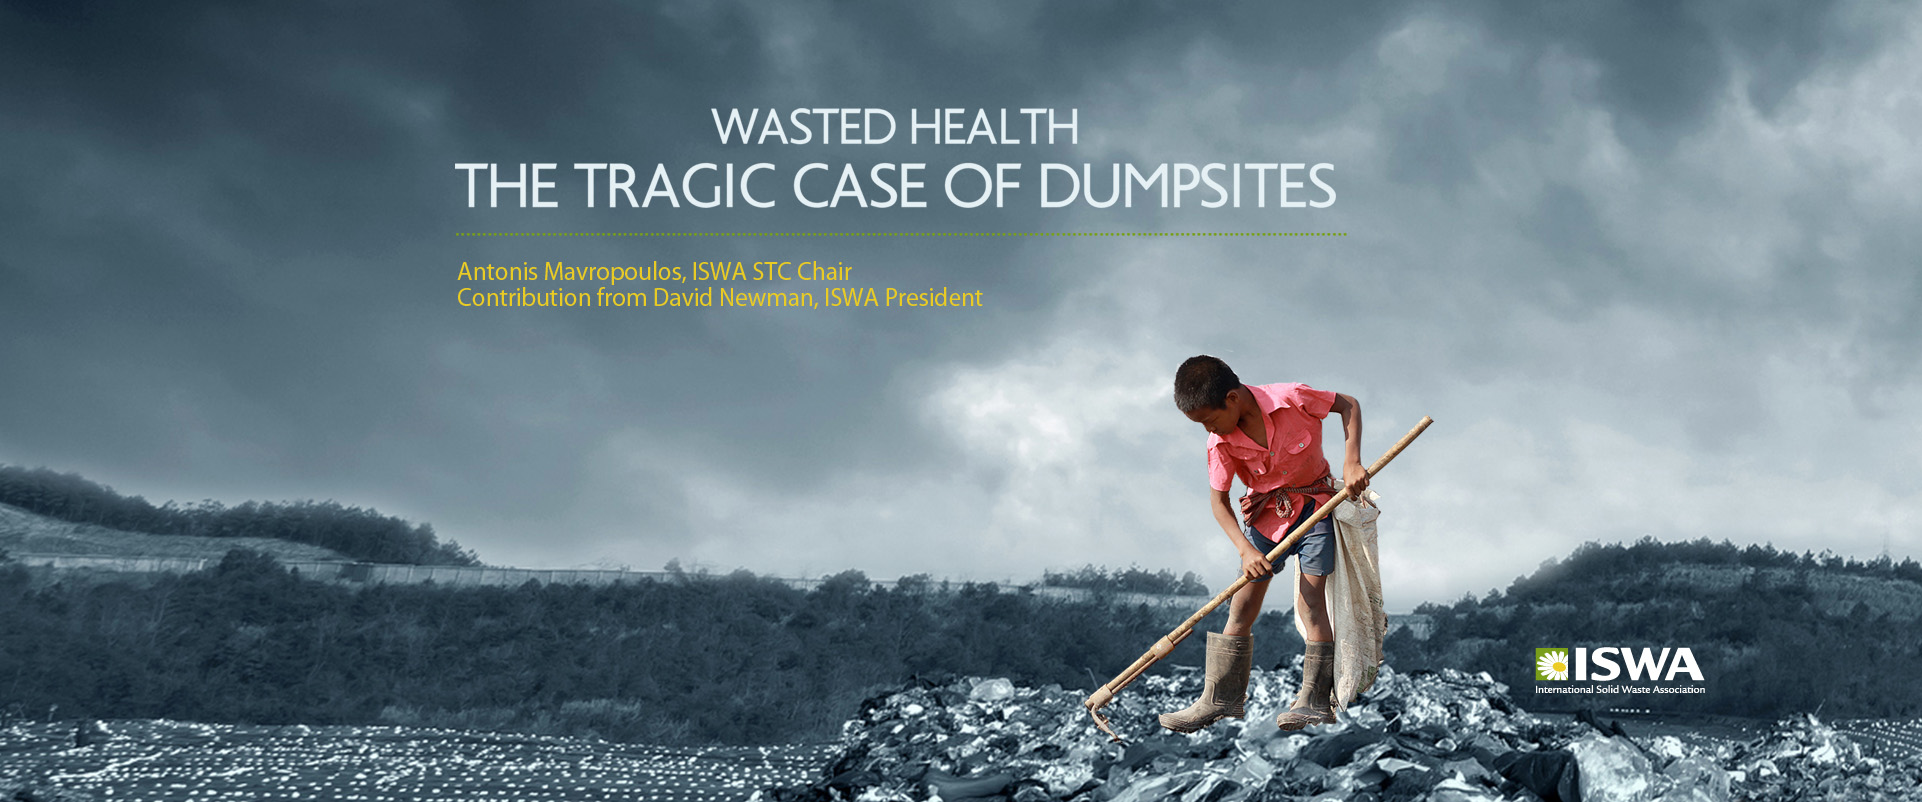 Wasted Health The Tragic Case Of Dumpsites